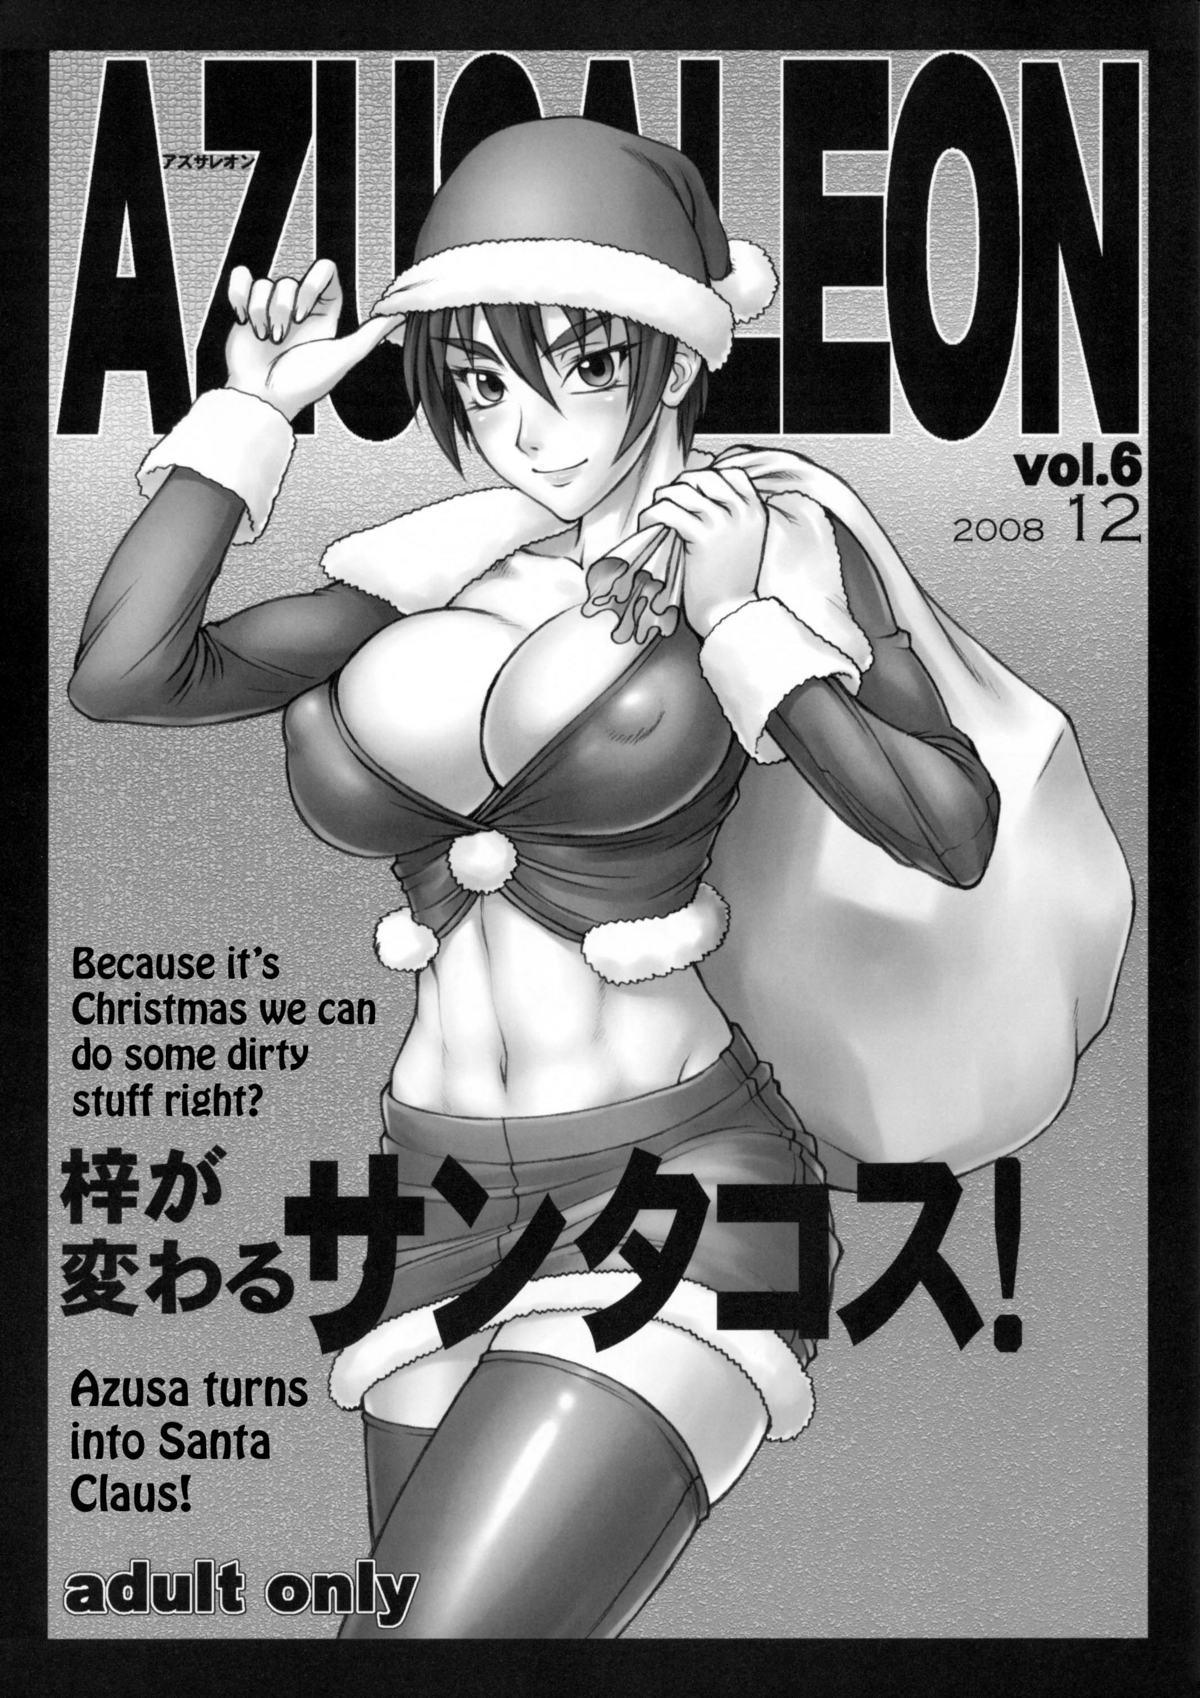 P.K.R + AZUSALEON Vol. 1.5, 5, 6 27